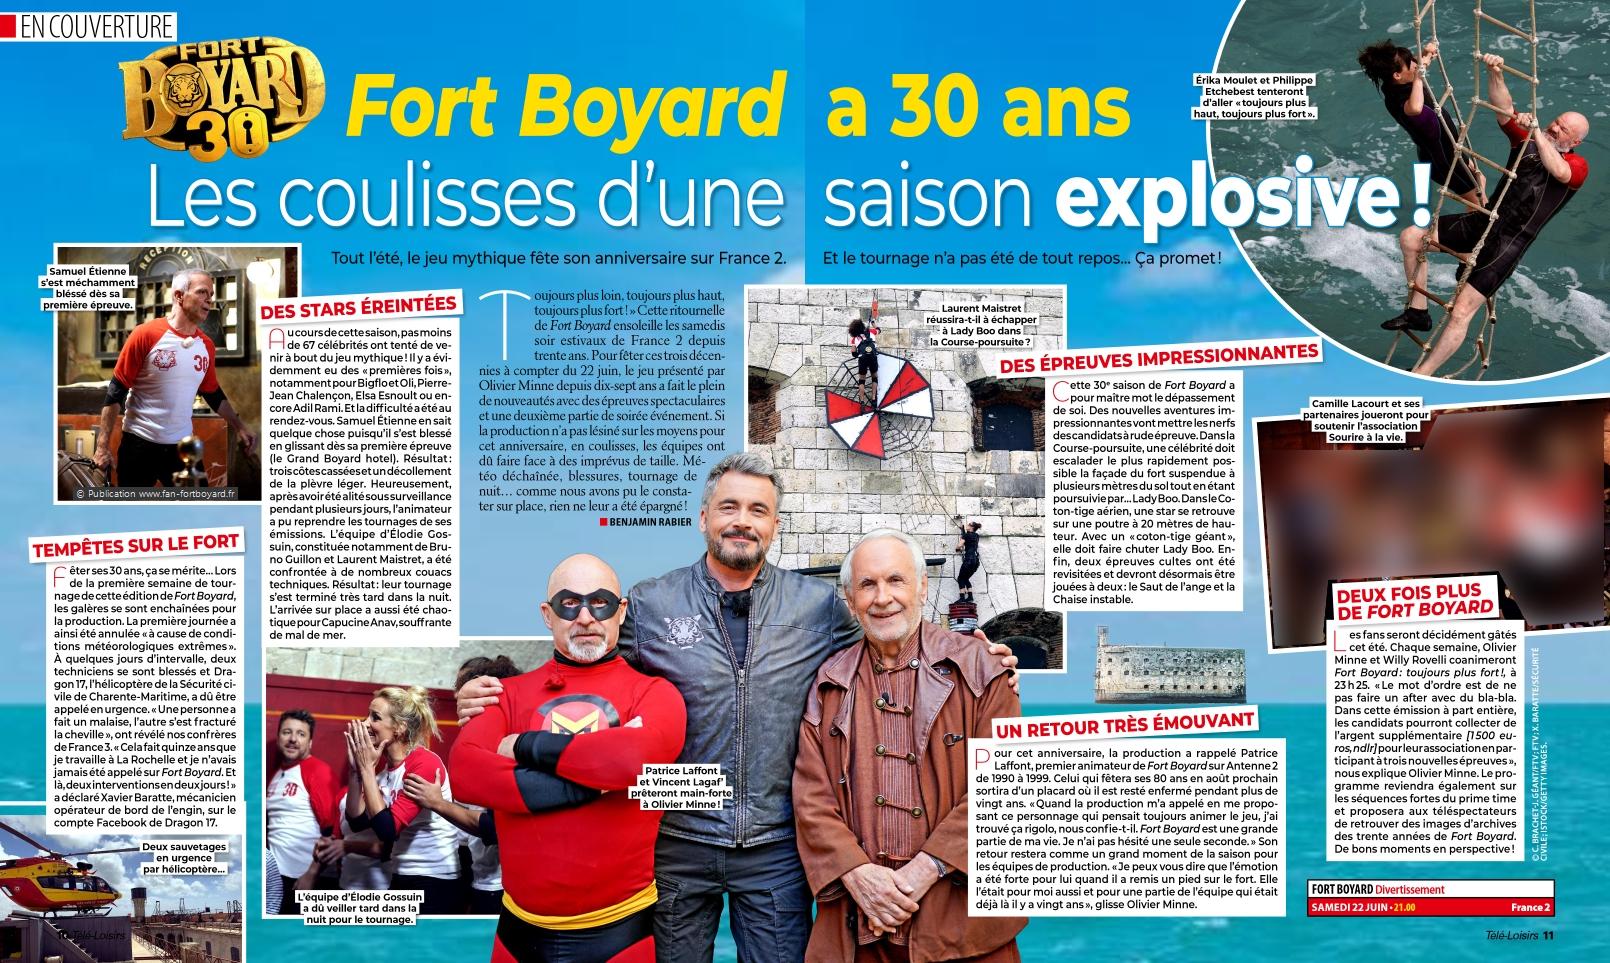 Revue de presse : Articles et reportages qui parlent de Fort Boyard 2019 Fort-boyard-2019-presse-teleloisirs-02